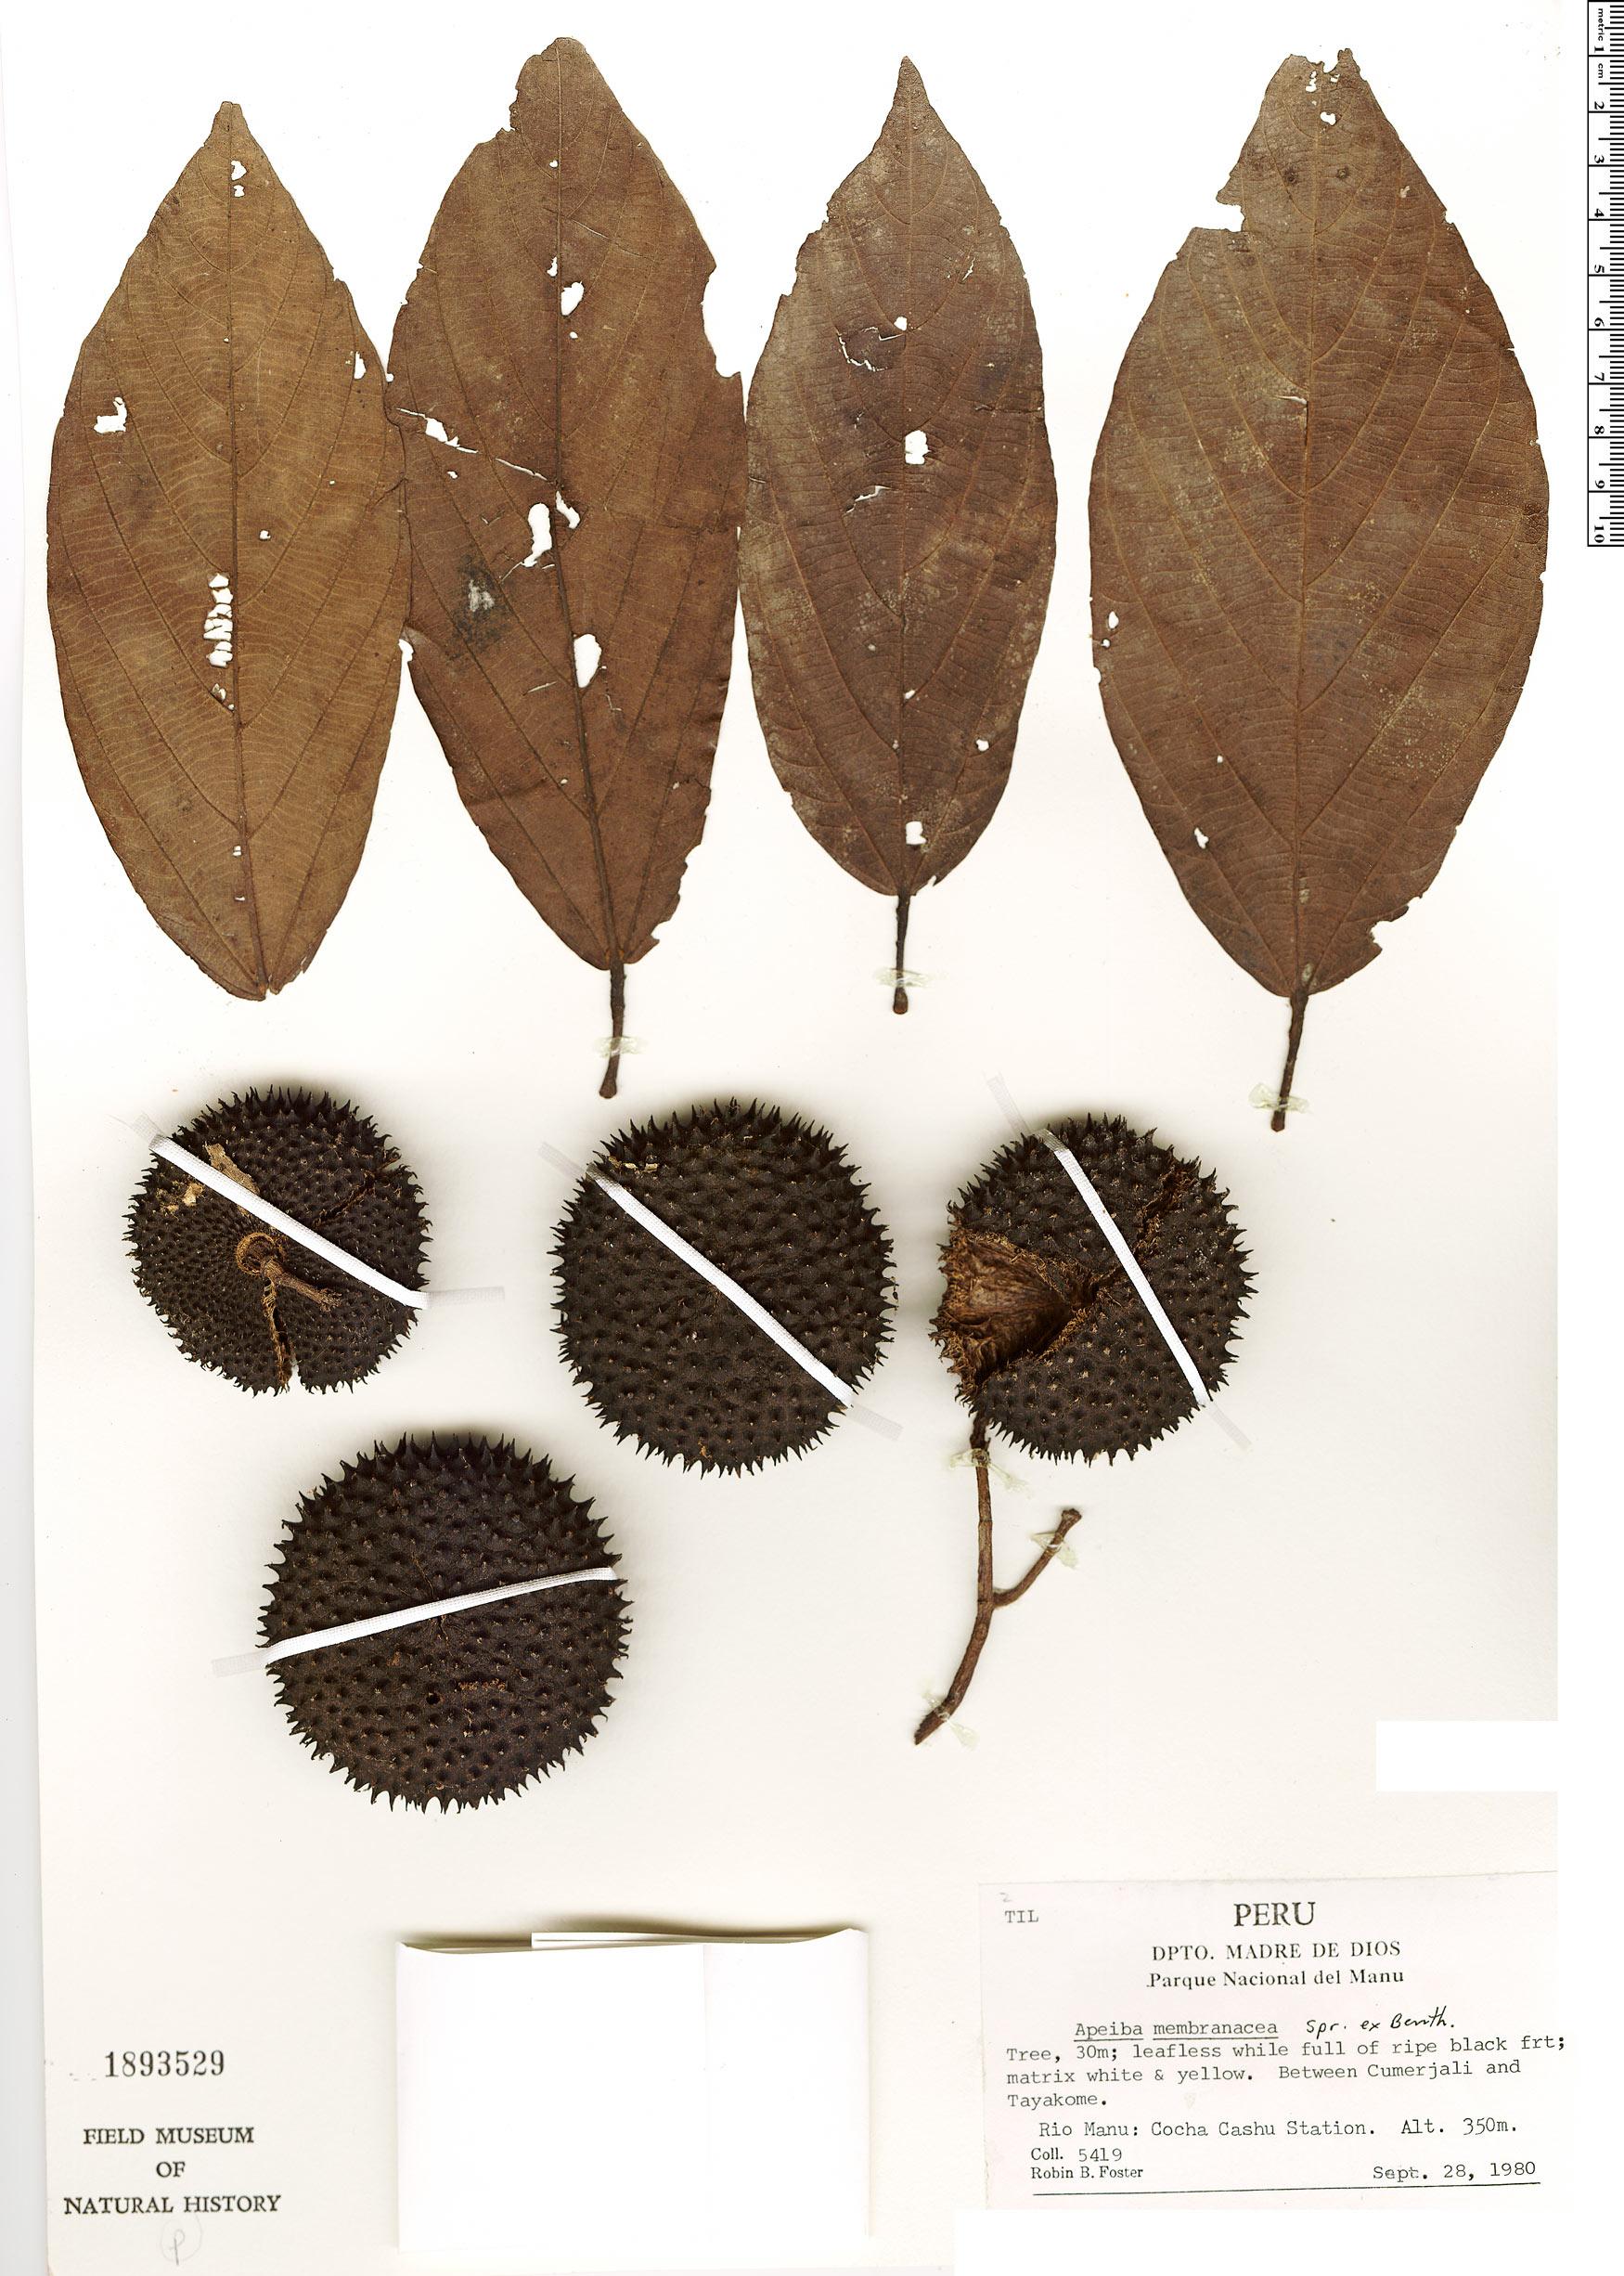 Specimen: Apeiba membranacea